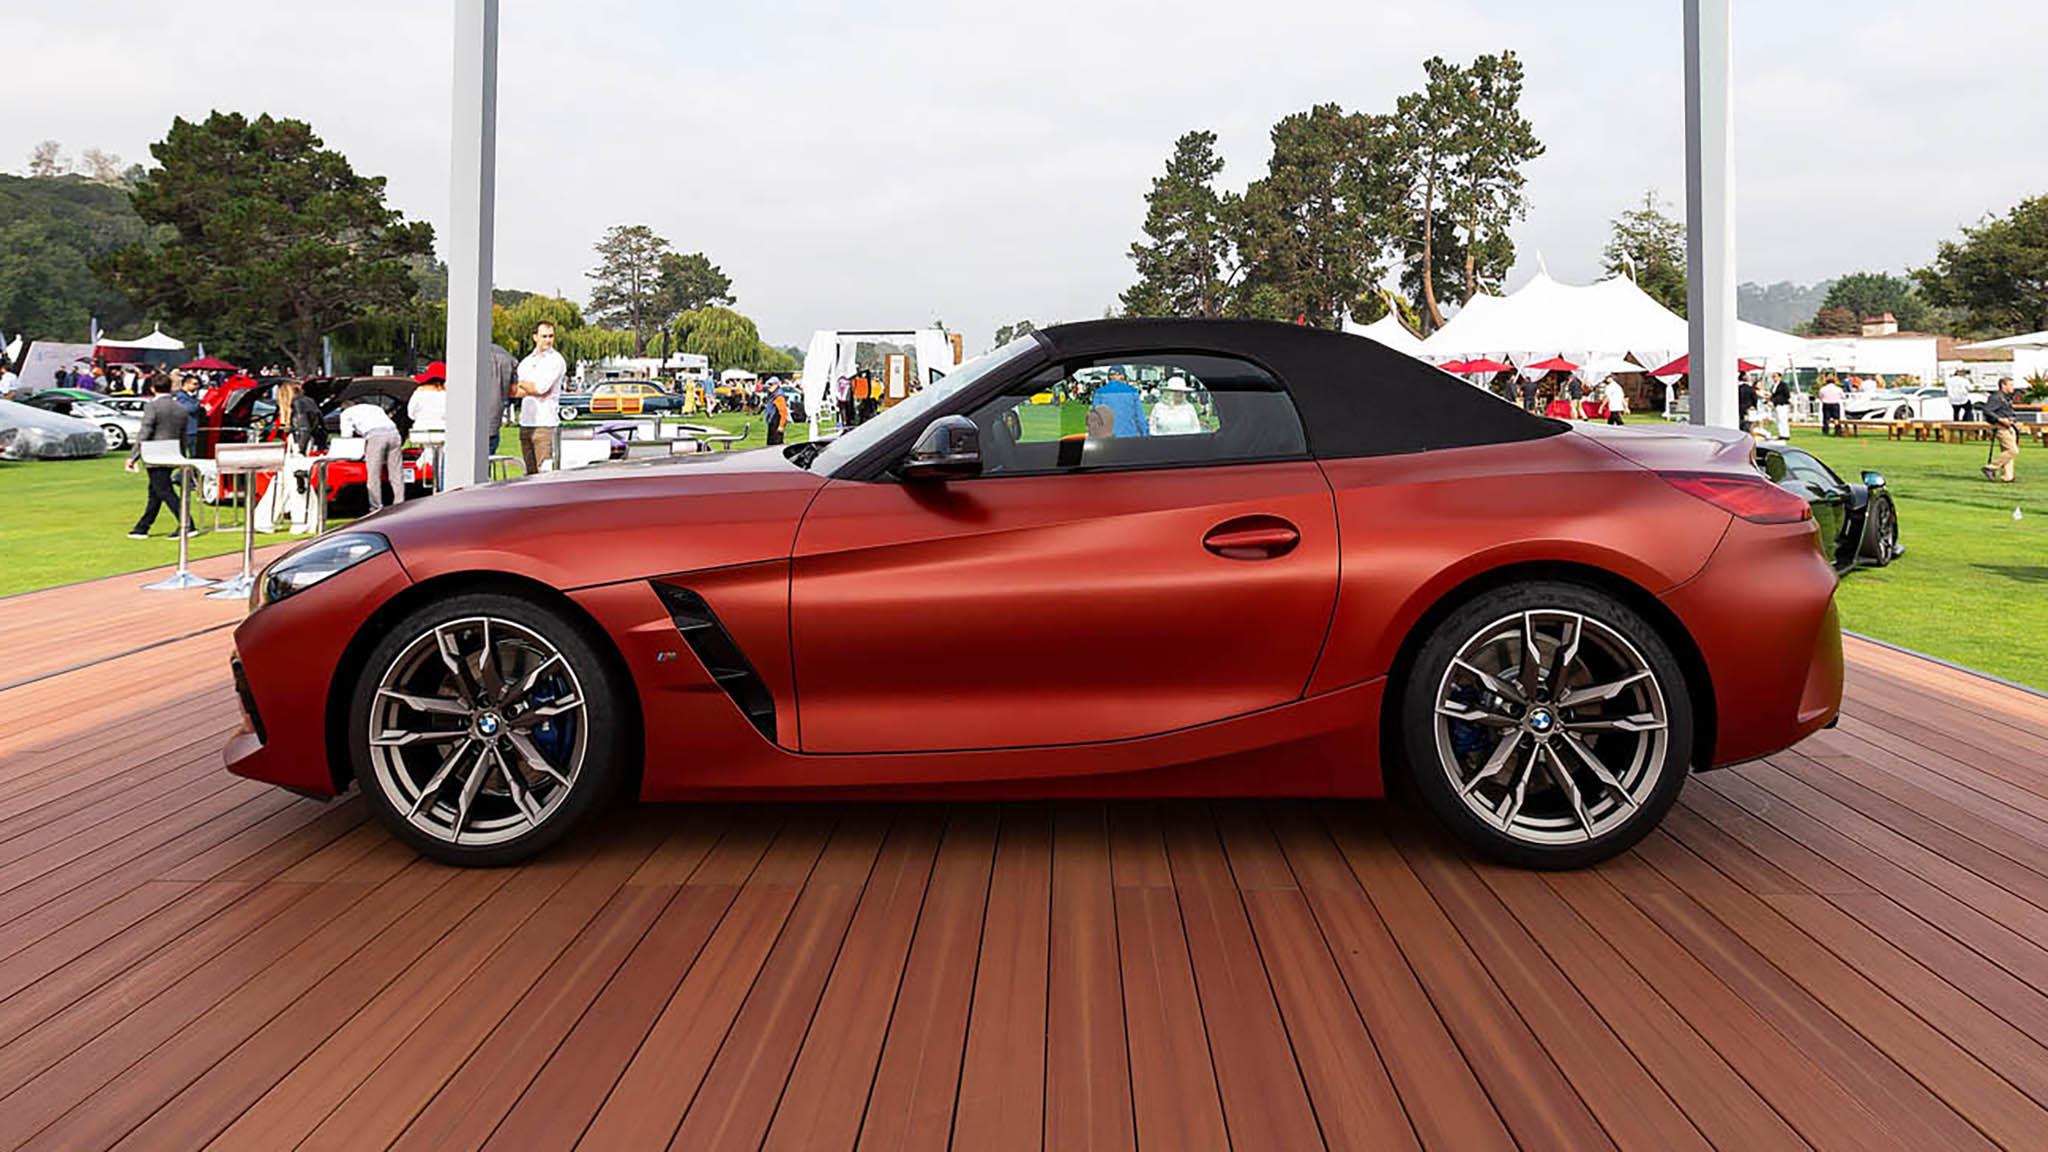 2019 BMW Z4 Pebble Beach Side